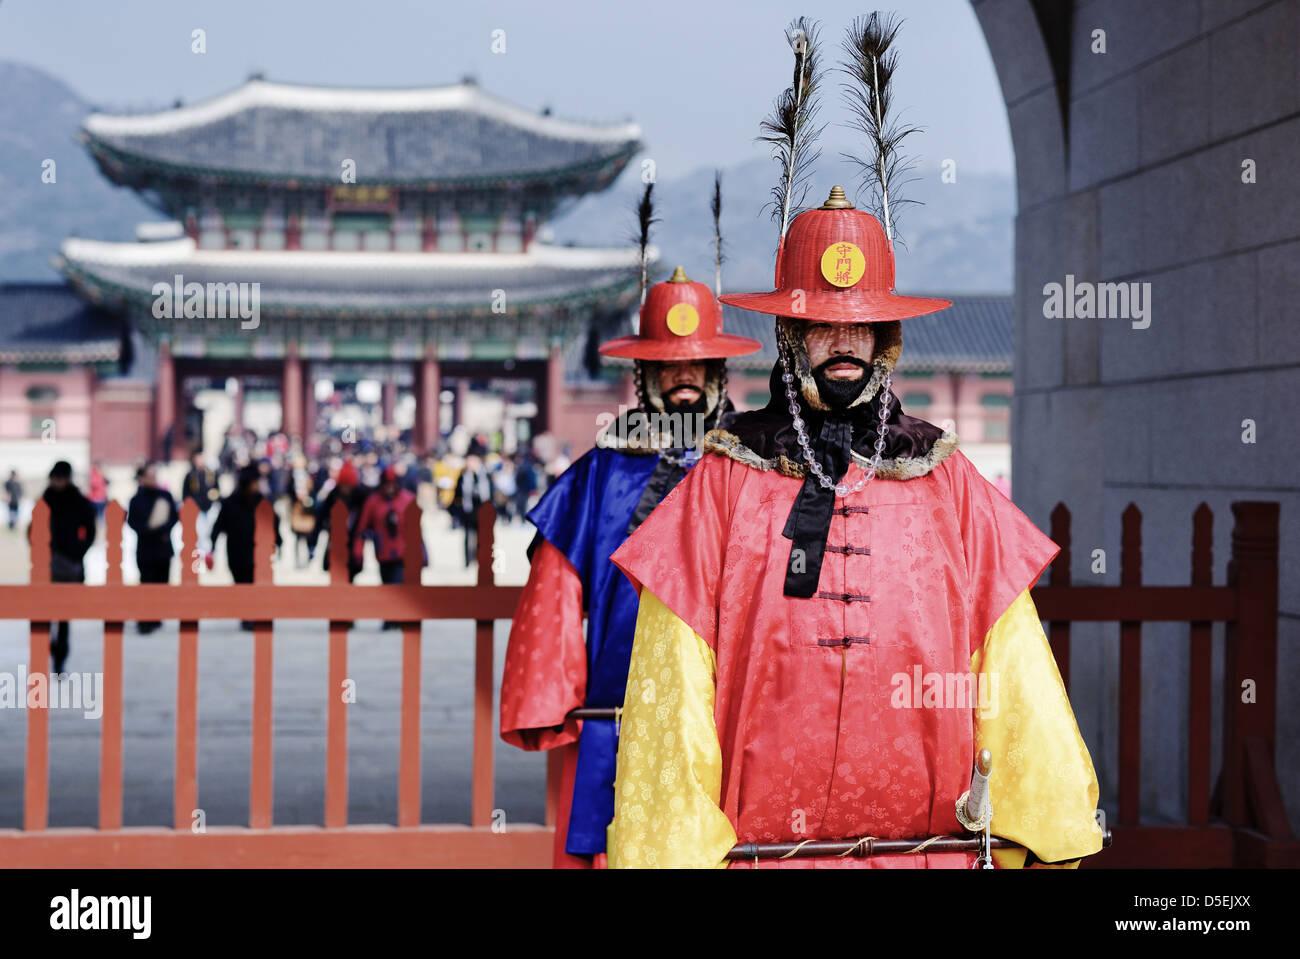 Gyeongbokgung Palace in Seoul, South Korea - Stock Image